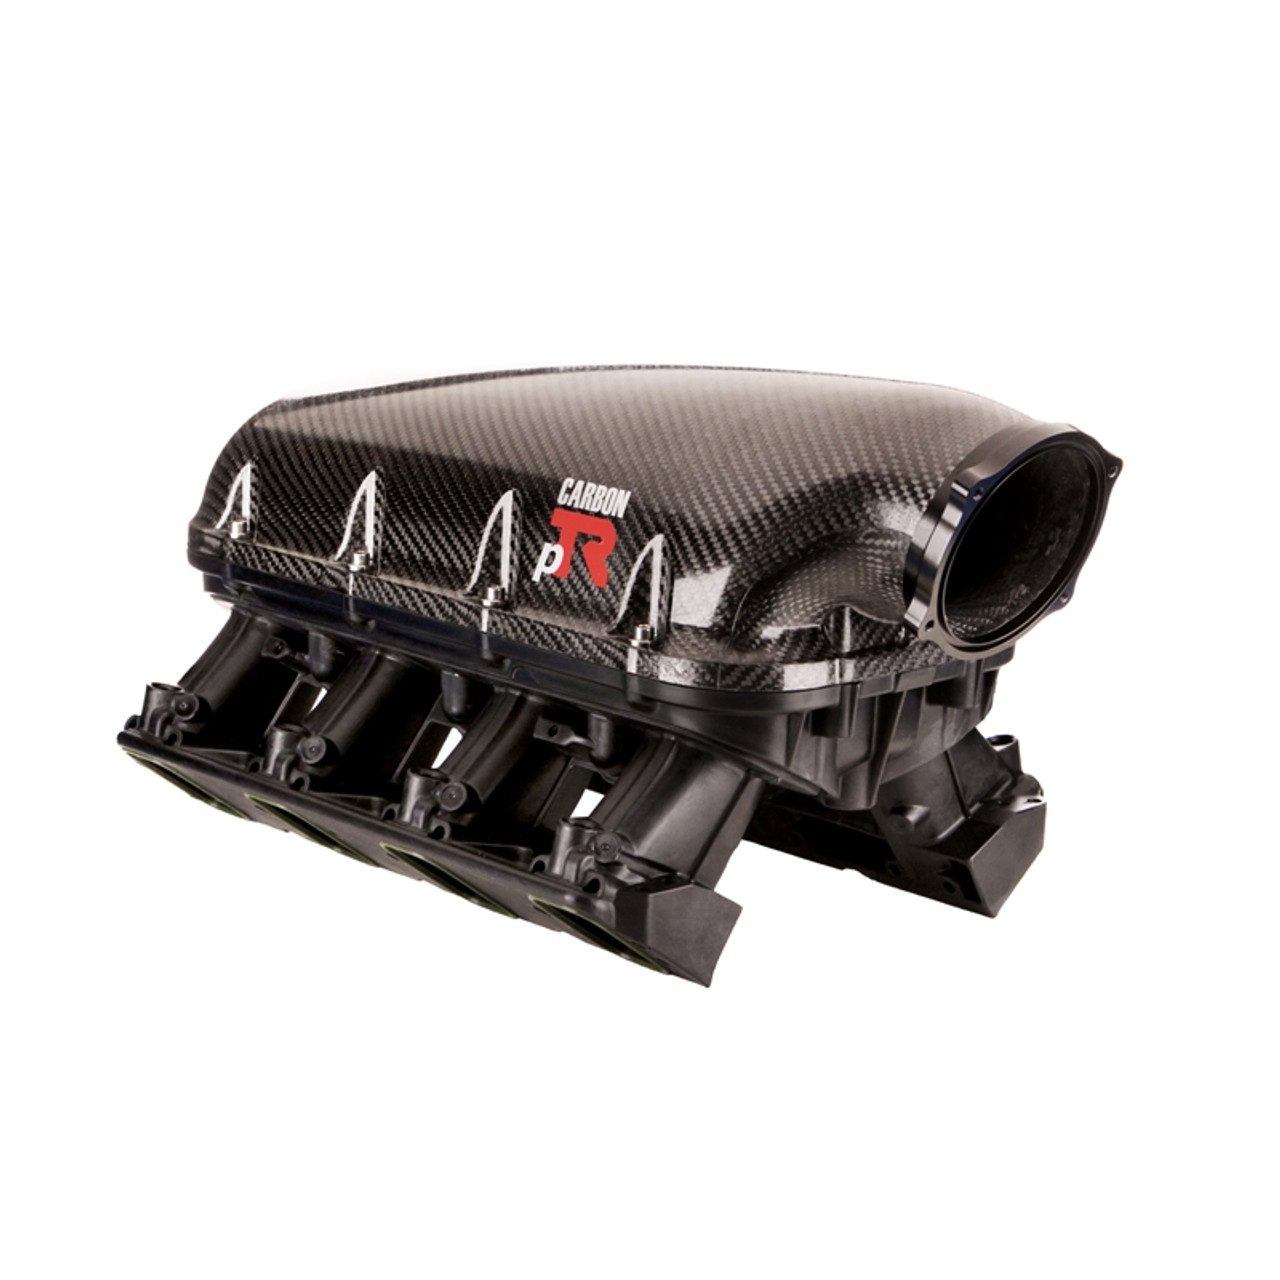 Performance Design Carbon pTR Intake Manifold   LS3 Port